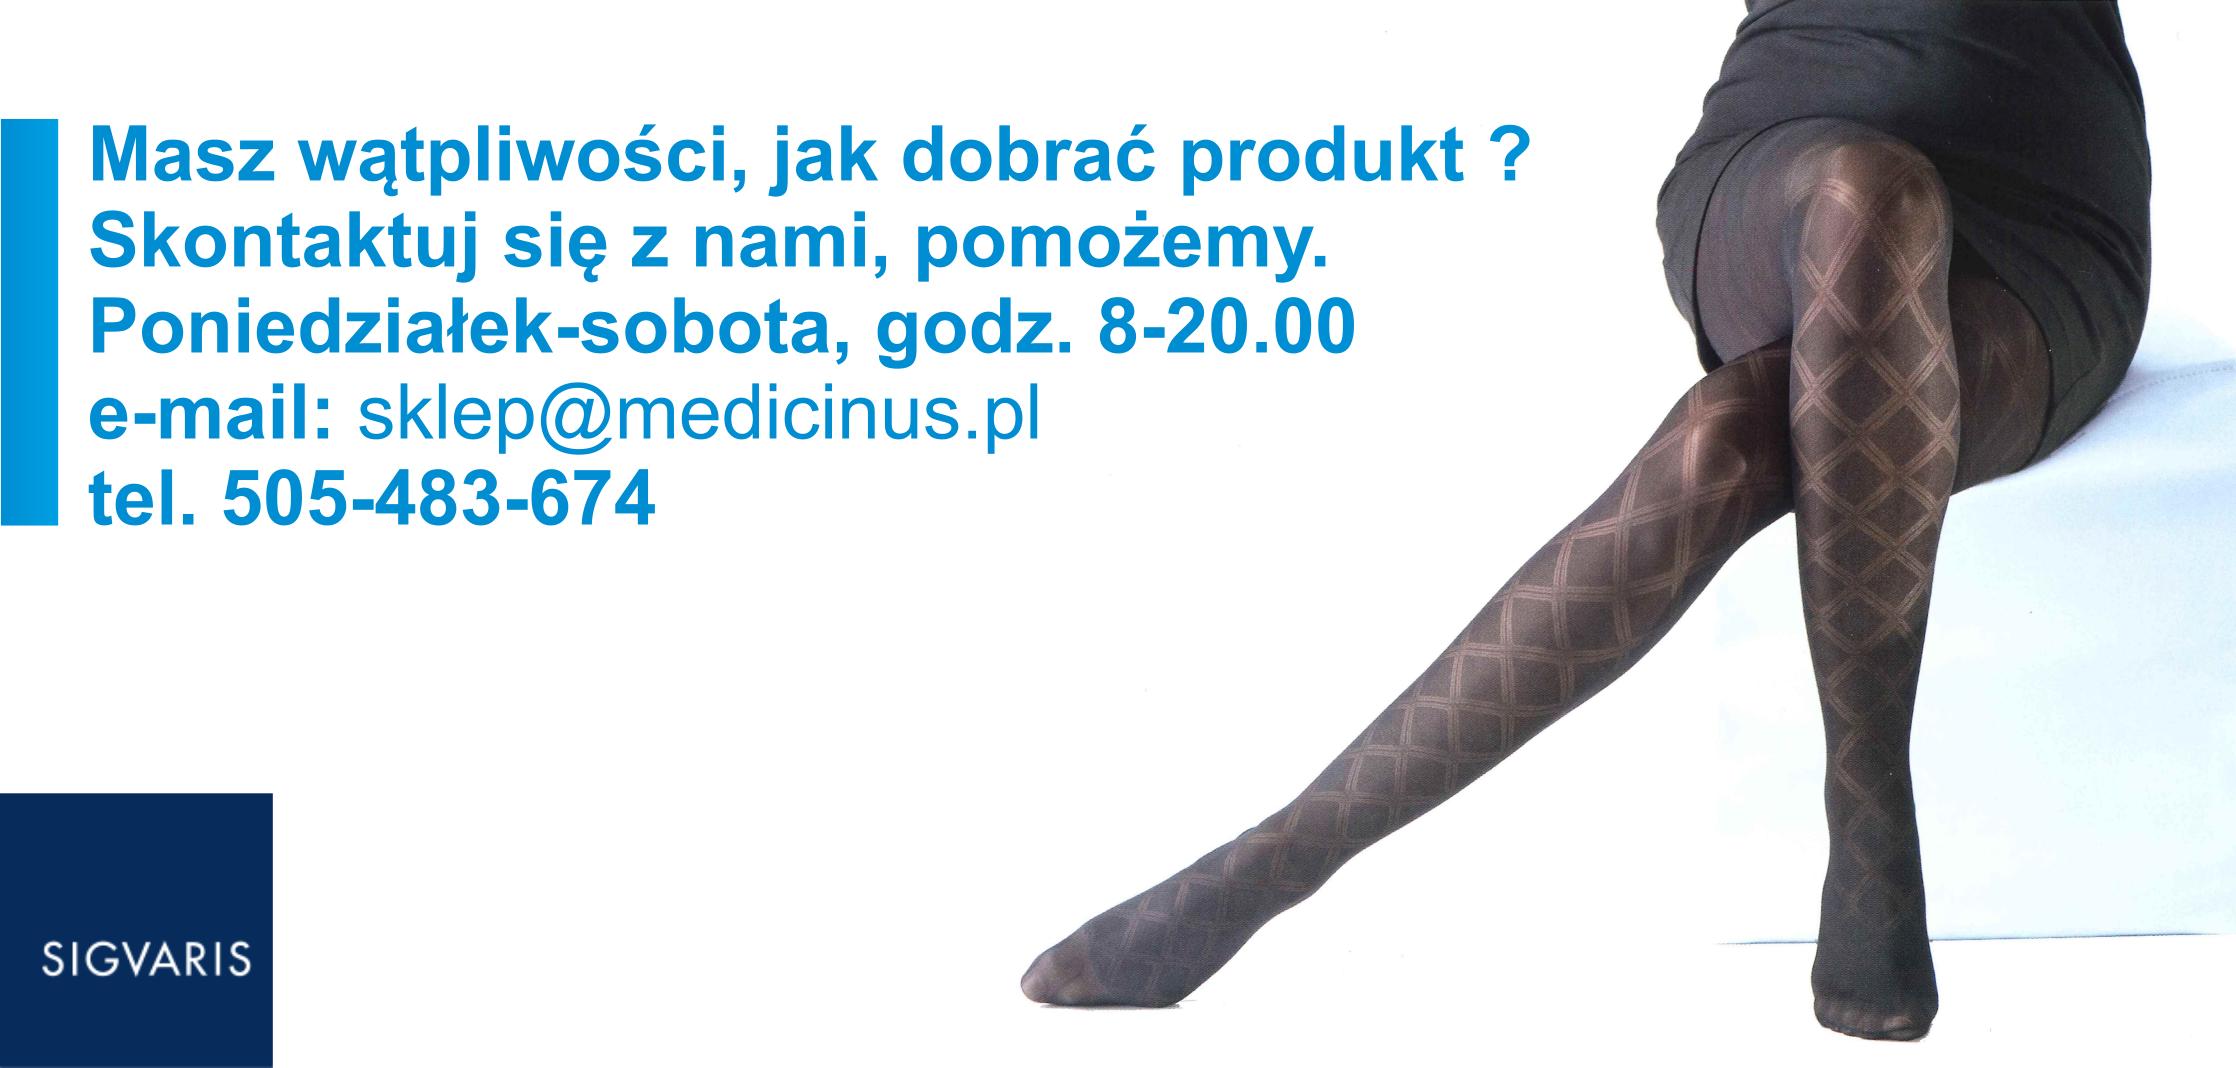 ac42d236efe2e7 Podkolanówki, pończochy i rajstopy uciskowe - Medicinus